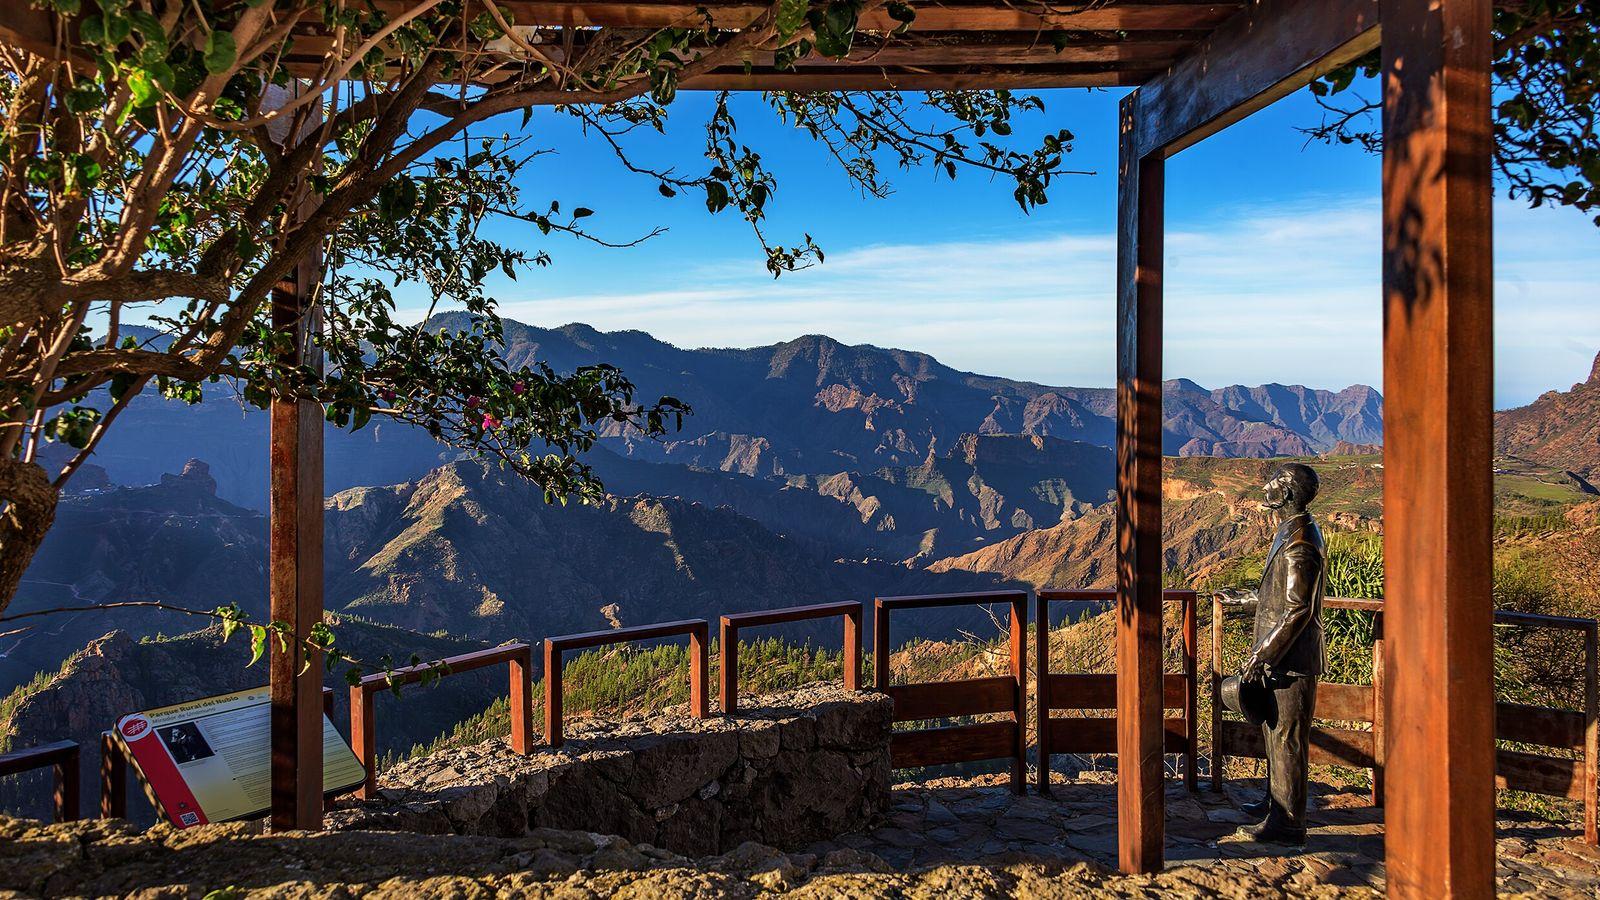 Mirador de Unamuno,one of the lookouts in the town of Artenara, locatedin the mountains of Gran ...